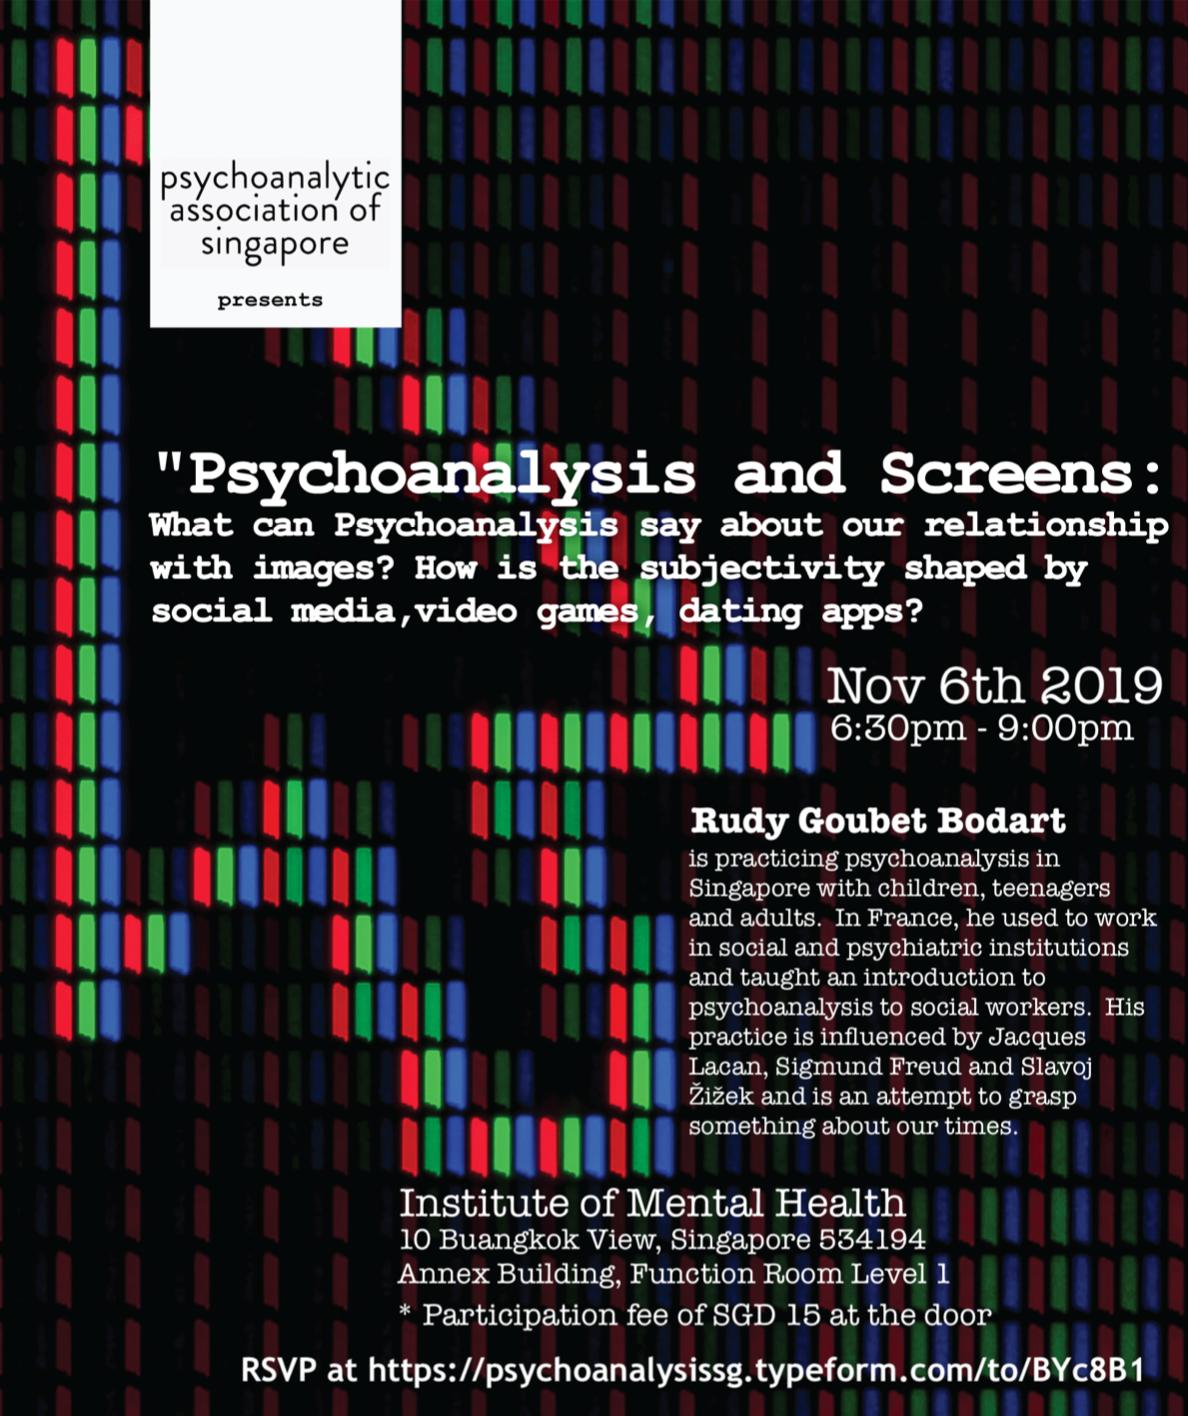 Psychoanalytic Association of Singapore (PAS) Symposium 6Nov2019 - psychoanalysis.sg.png